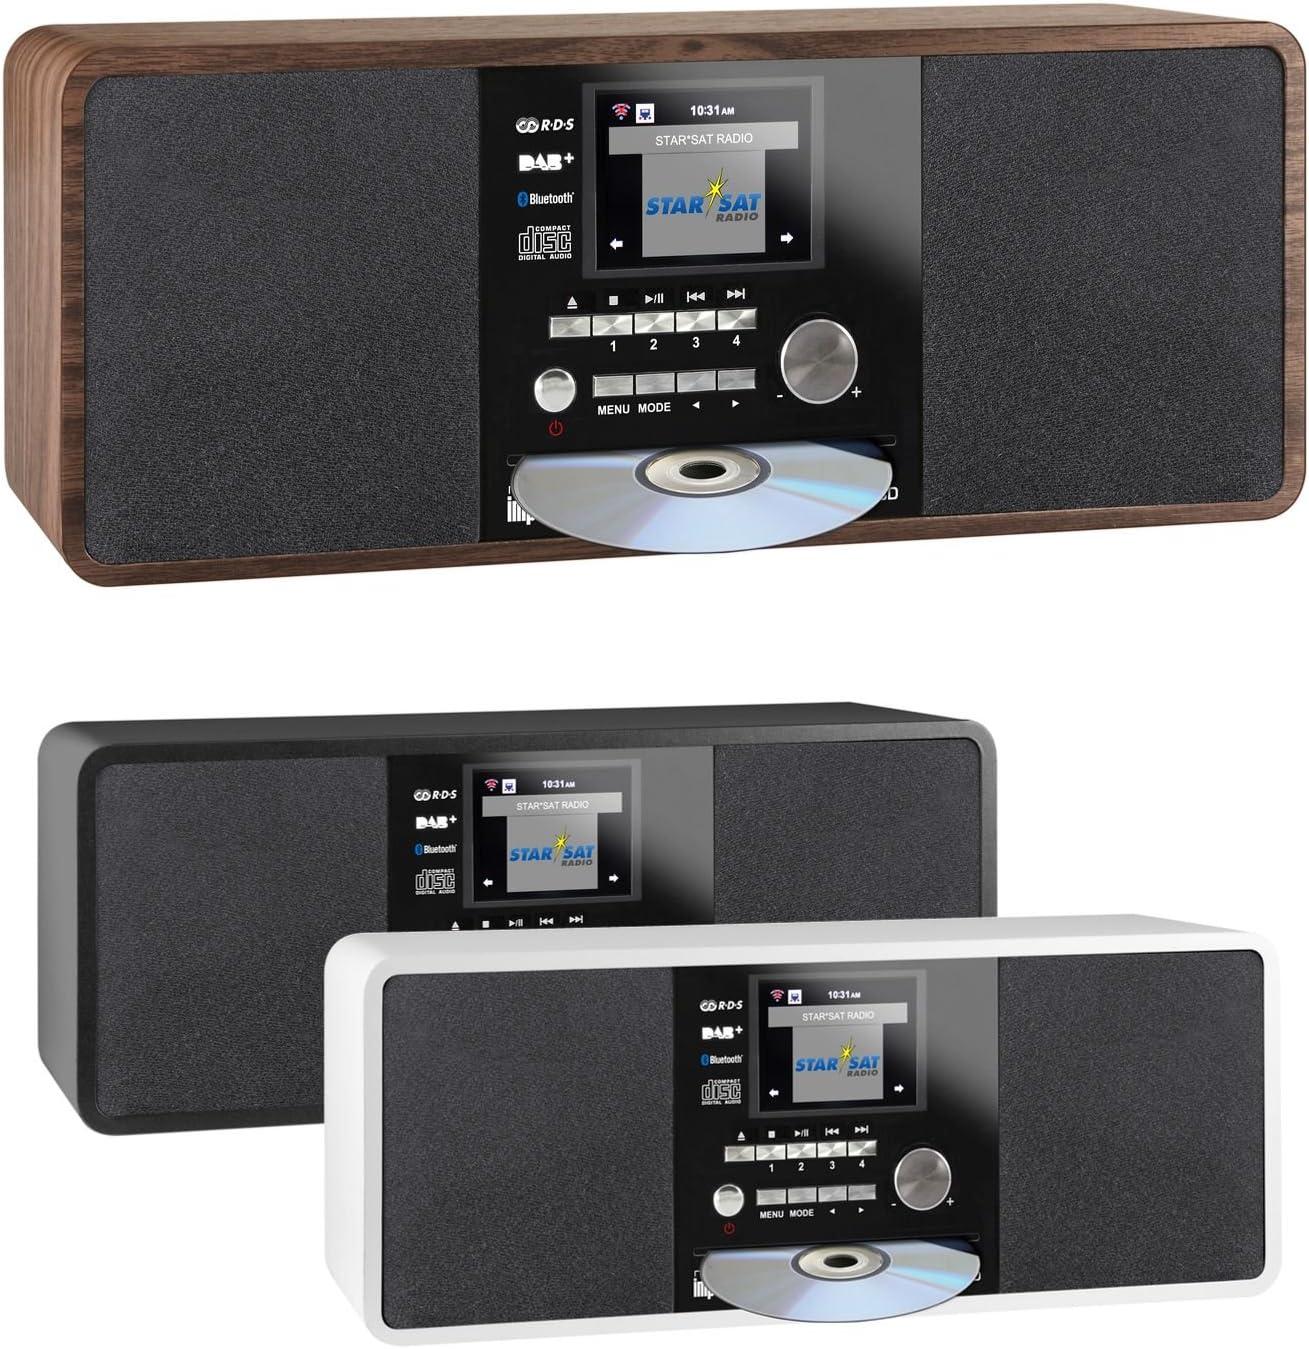 Imperial Dabman I200 Hybrid And Internet Radio Dab Elektronik